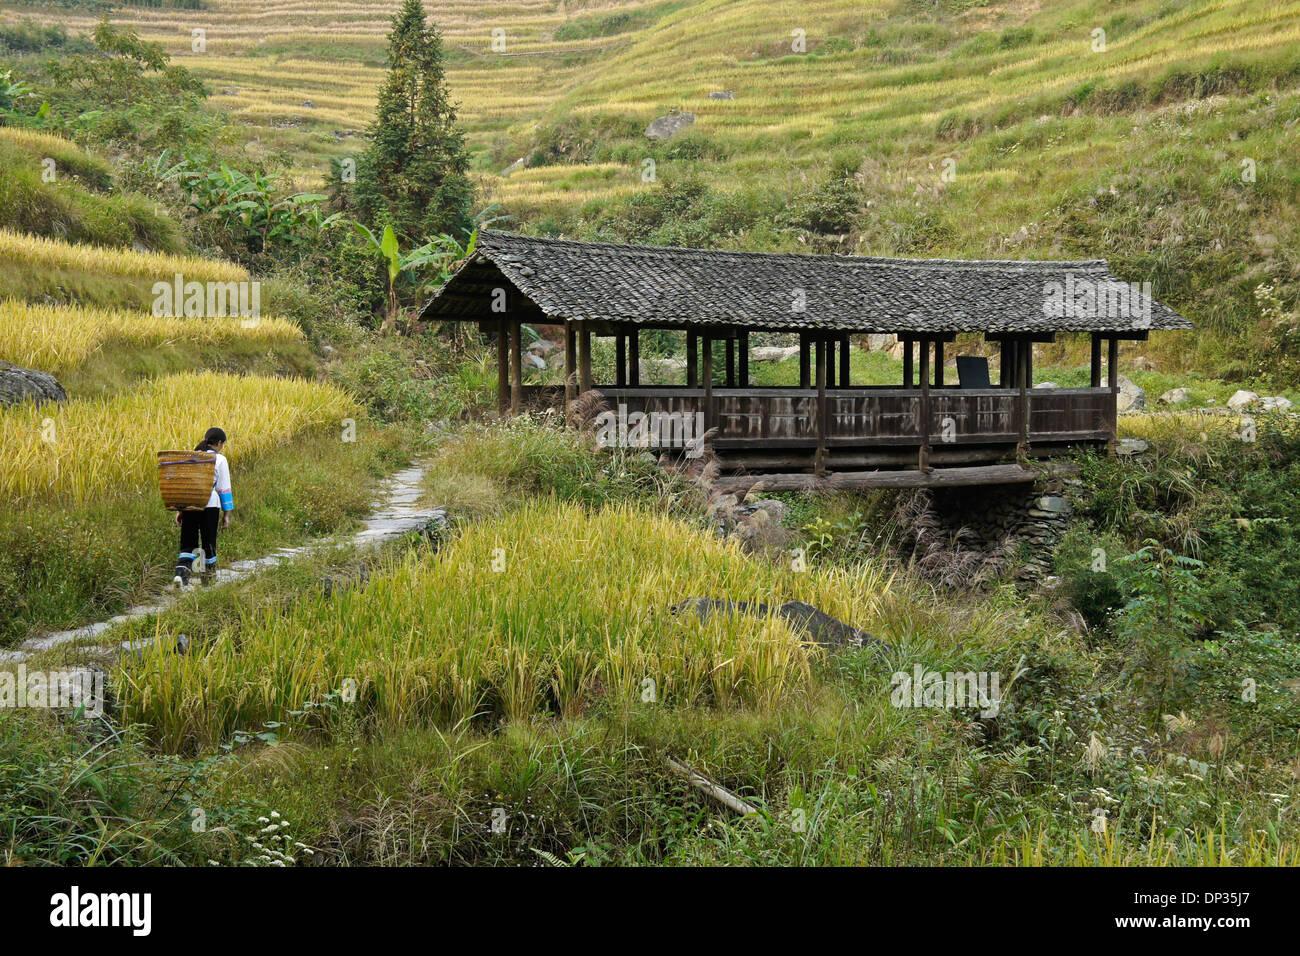 Old covered bridge in Longsheng (Longji) rice terraces, Guangxi, China - Stock Image